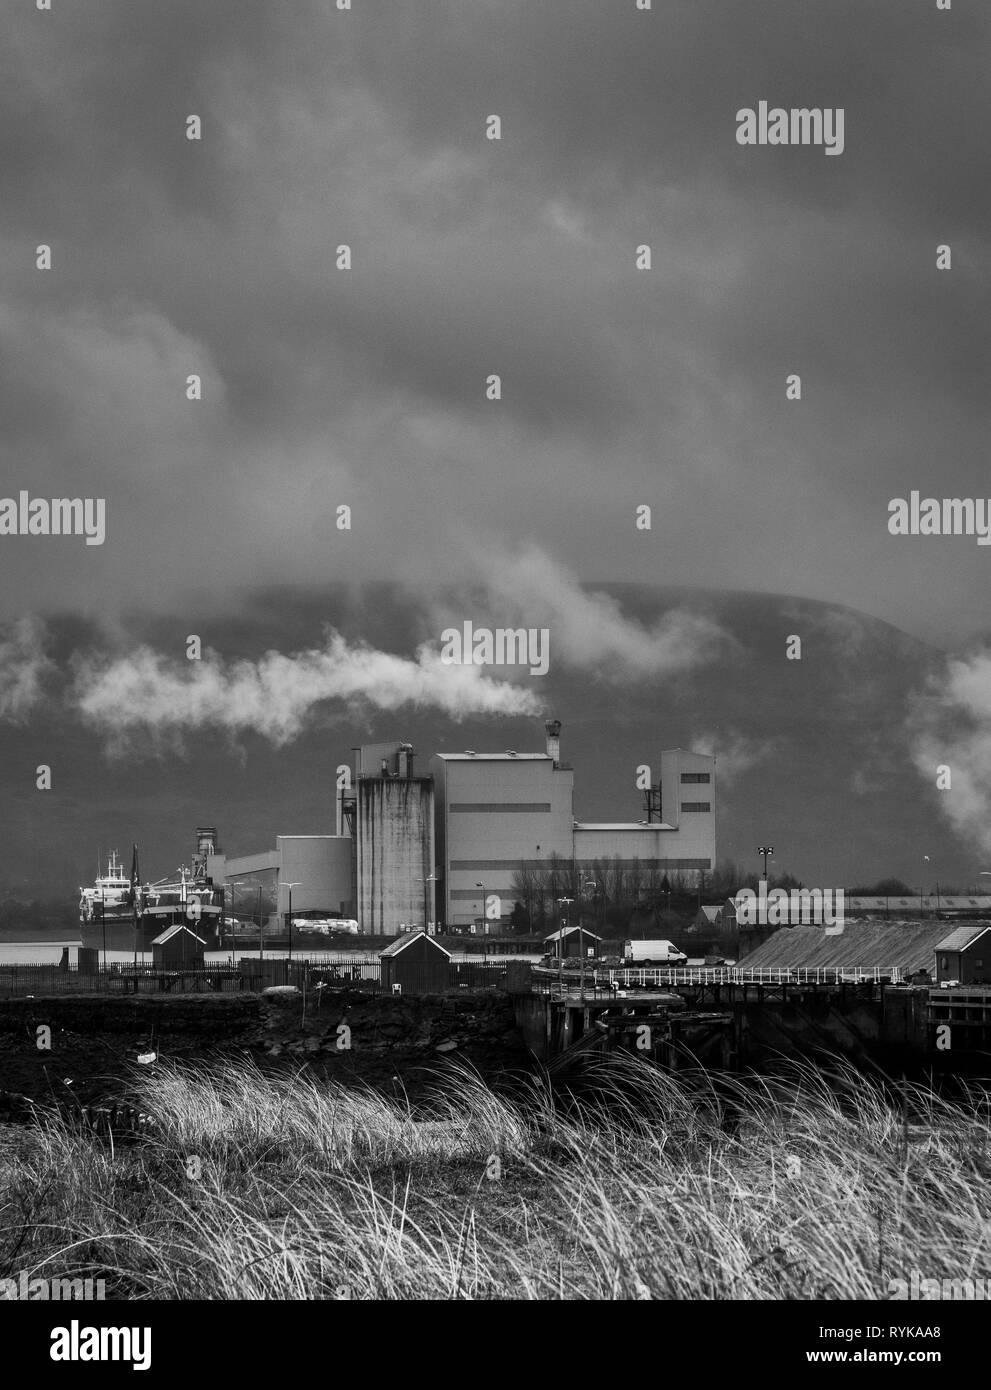 Regeneration of Industry - Stock Image